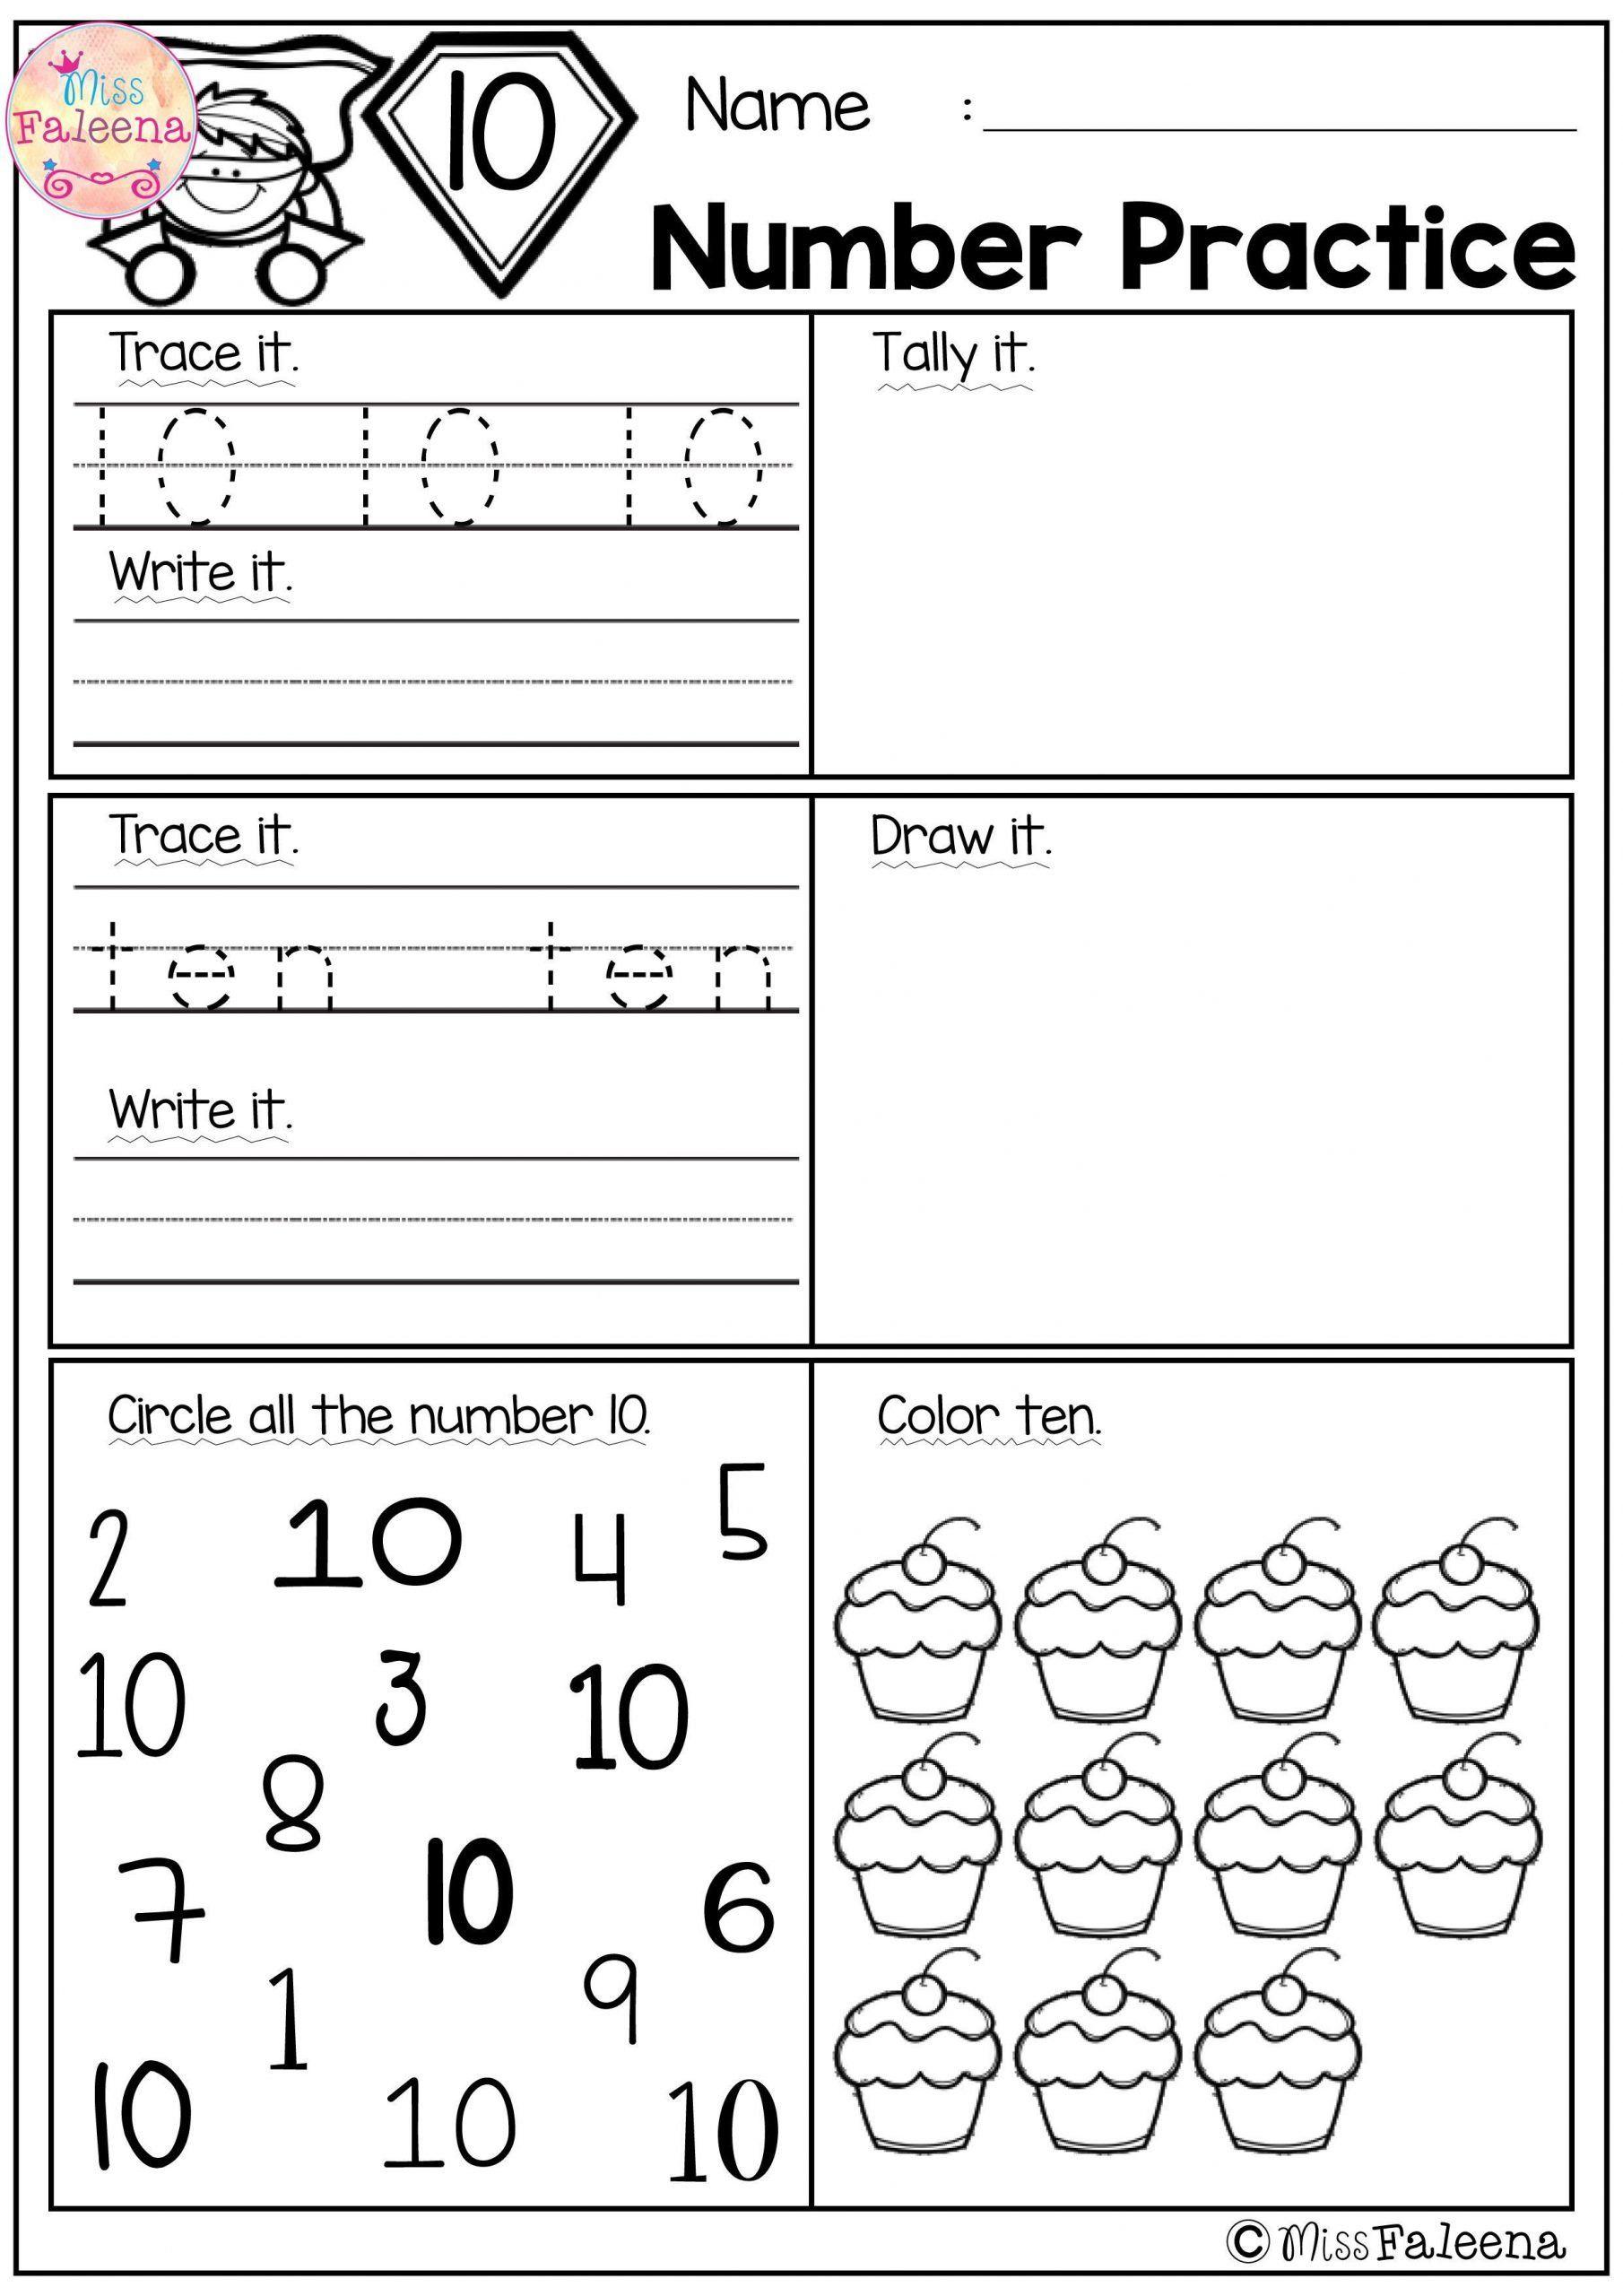 Writing Number Worksheets 1 20 Number 1 20 Practice Set 1